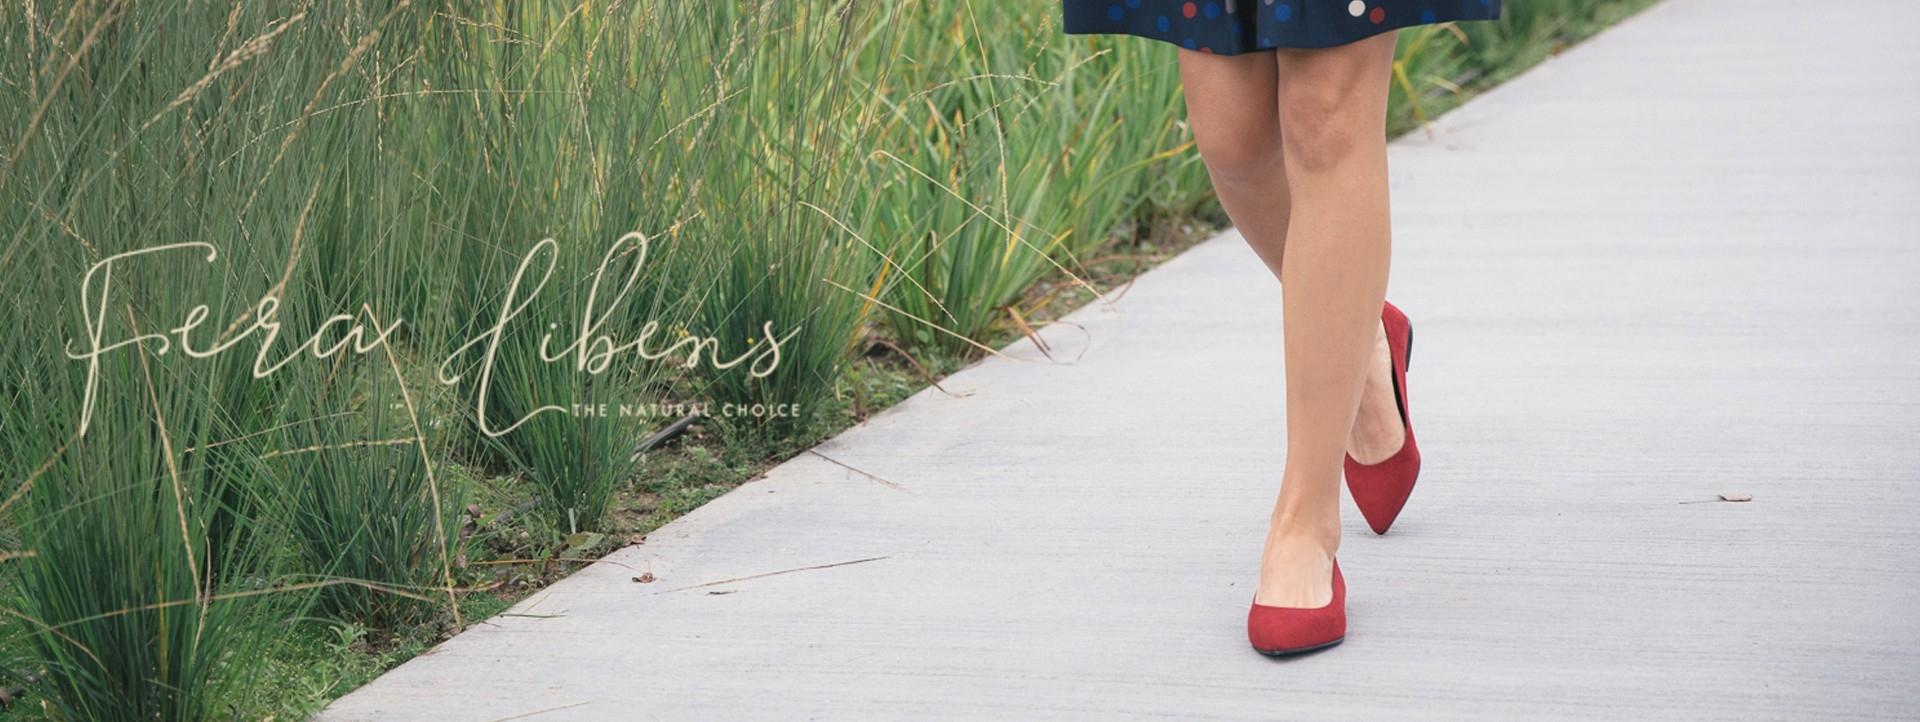 FeraLibens - VeganShoes.it